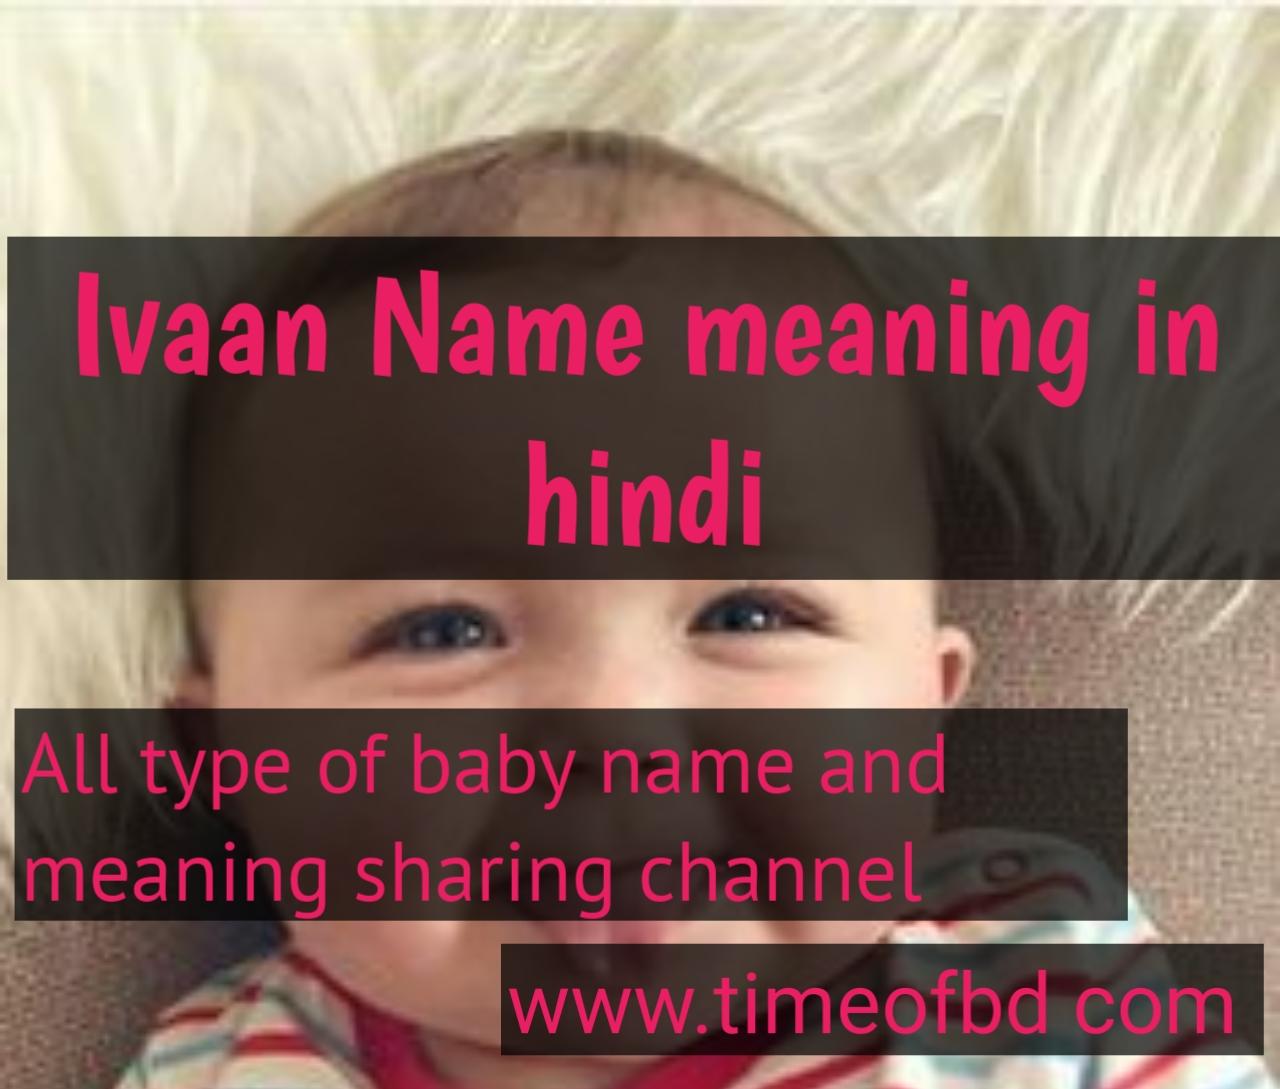 ivaan name meaning in hindi, ivaan ka meaning ,ivaan meaning in hindi dictioanry,meaning of ivaan in hindi